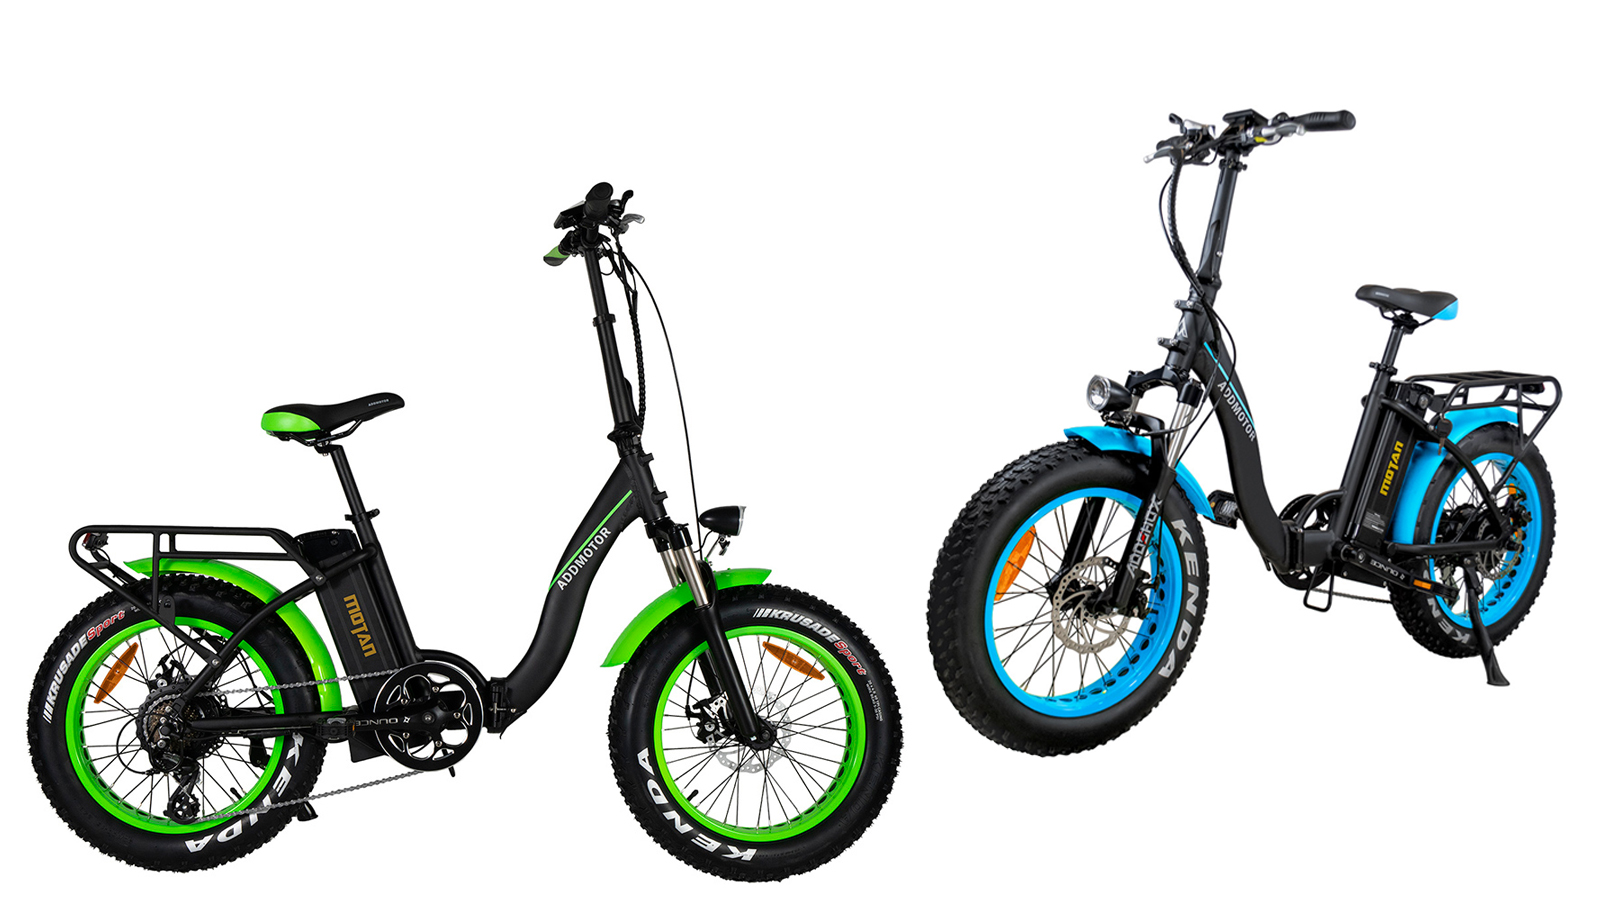 Motan M-140 P7 Foldable Electric Step-Thru Bike